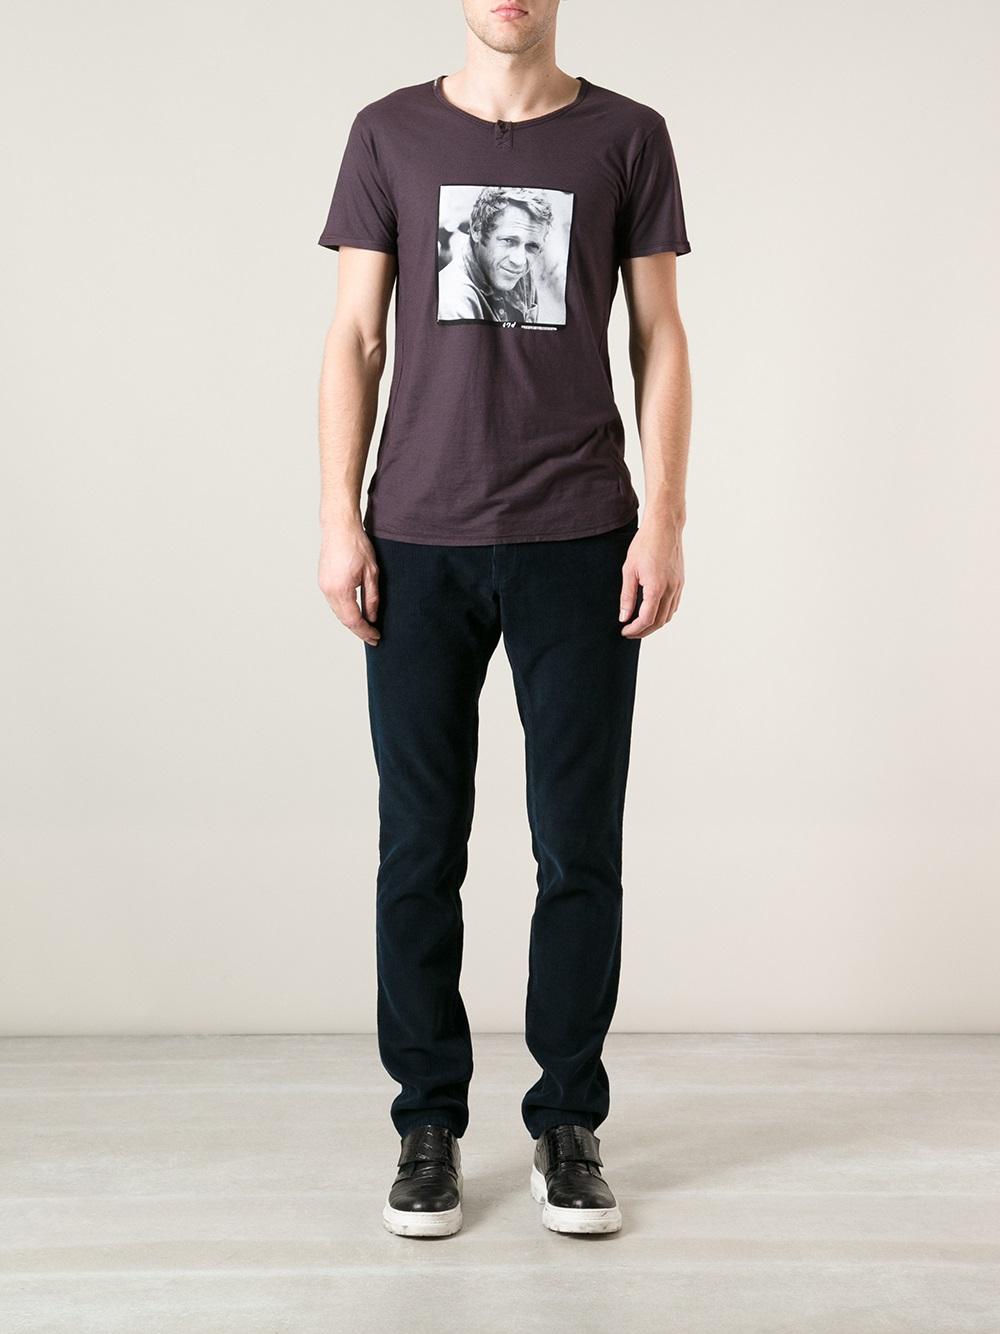 lyst dolce gabbana steve mcqueen tshirt in black for men. Black Bedroom Furniture Sets. Home Design Ideas